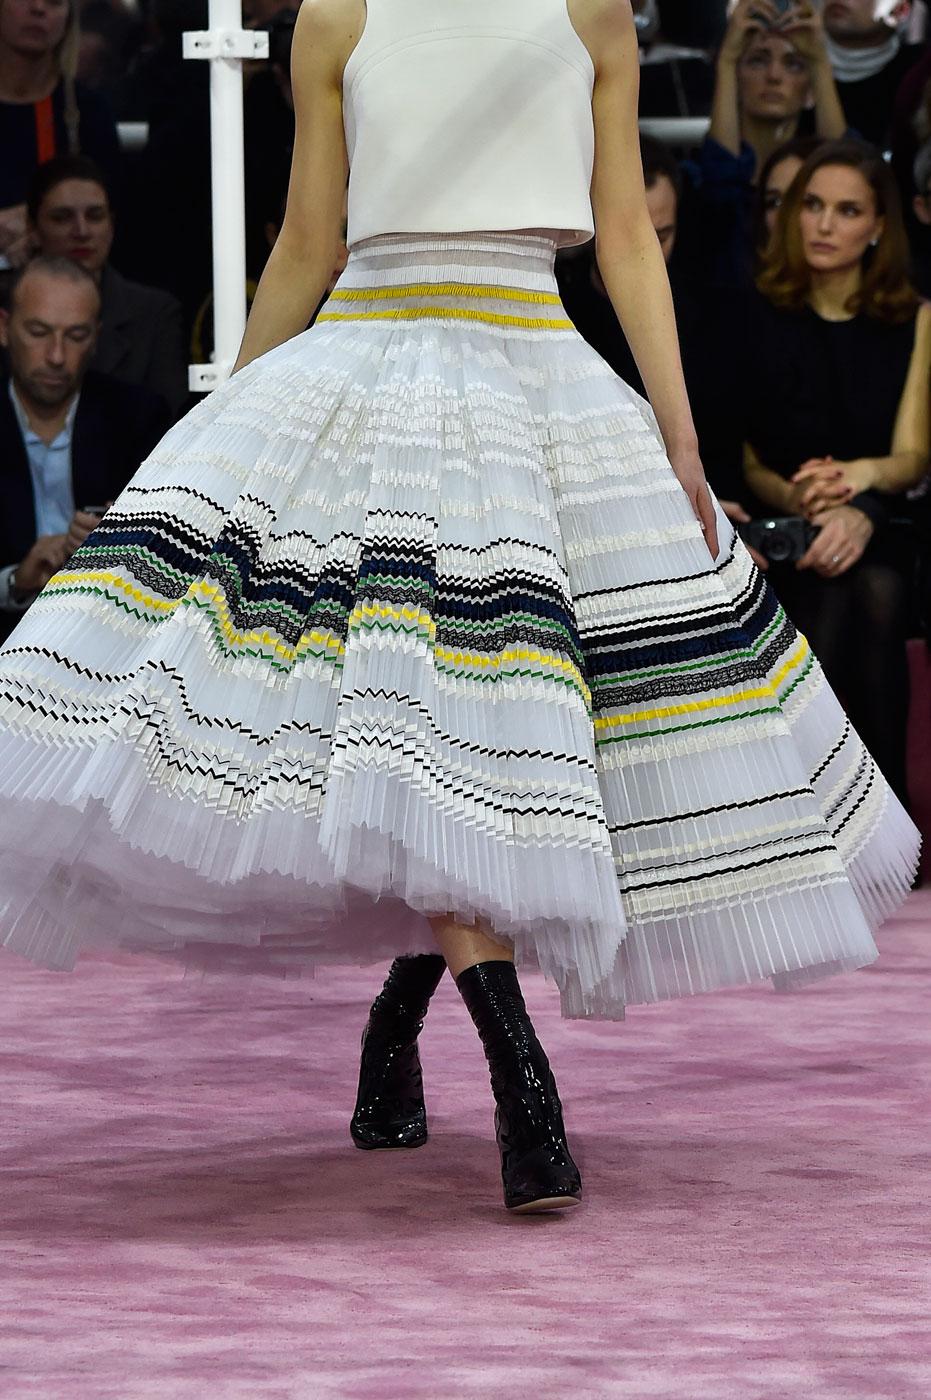 Christian-Dior-fashion-runway-show-close-ups-haute-couture-paris-spring-summer-2015-the-impression-147